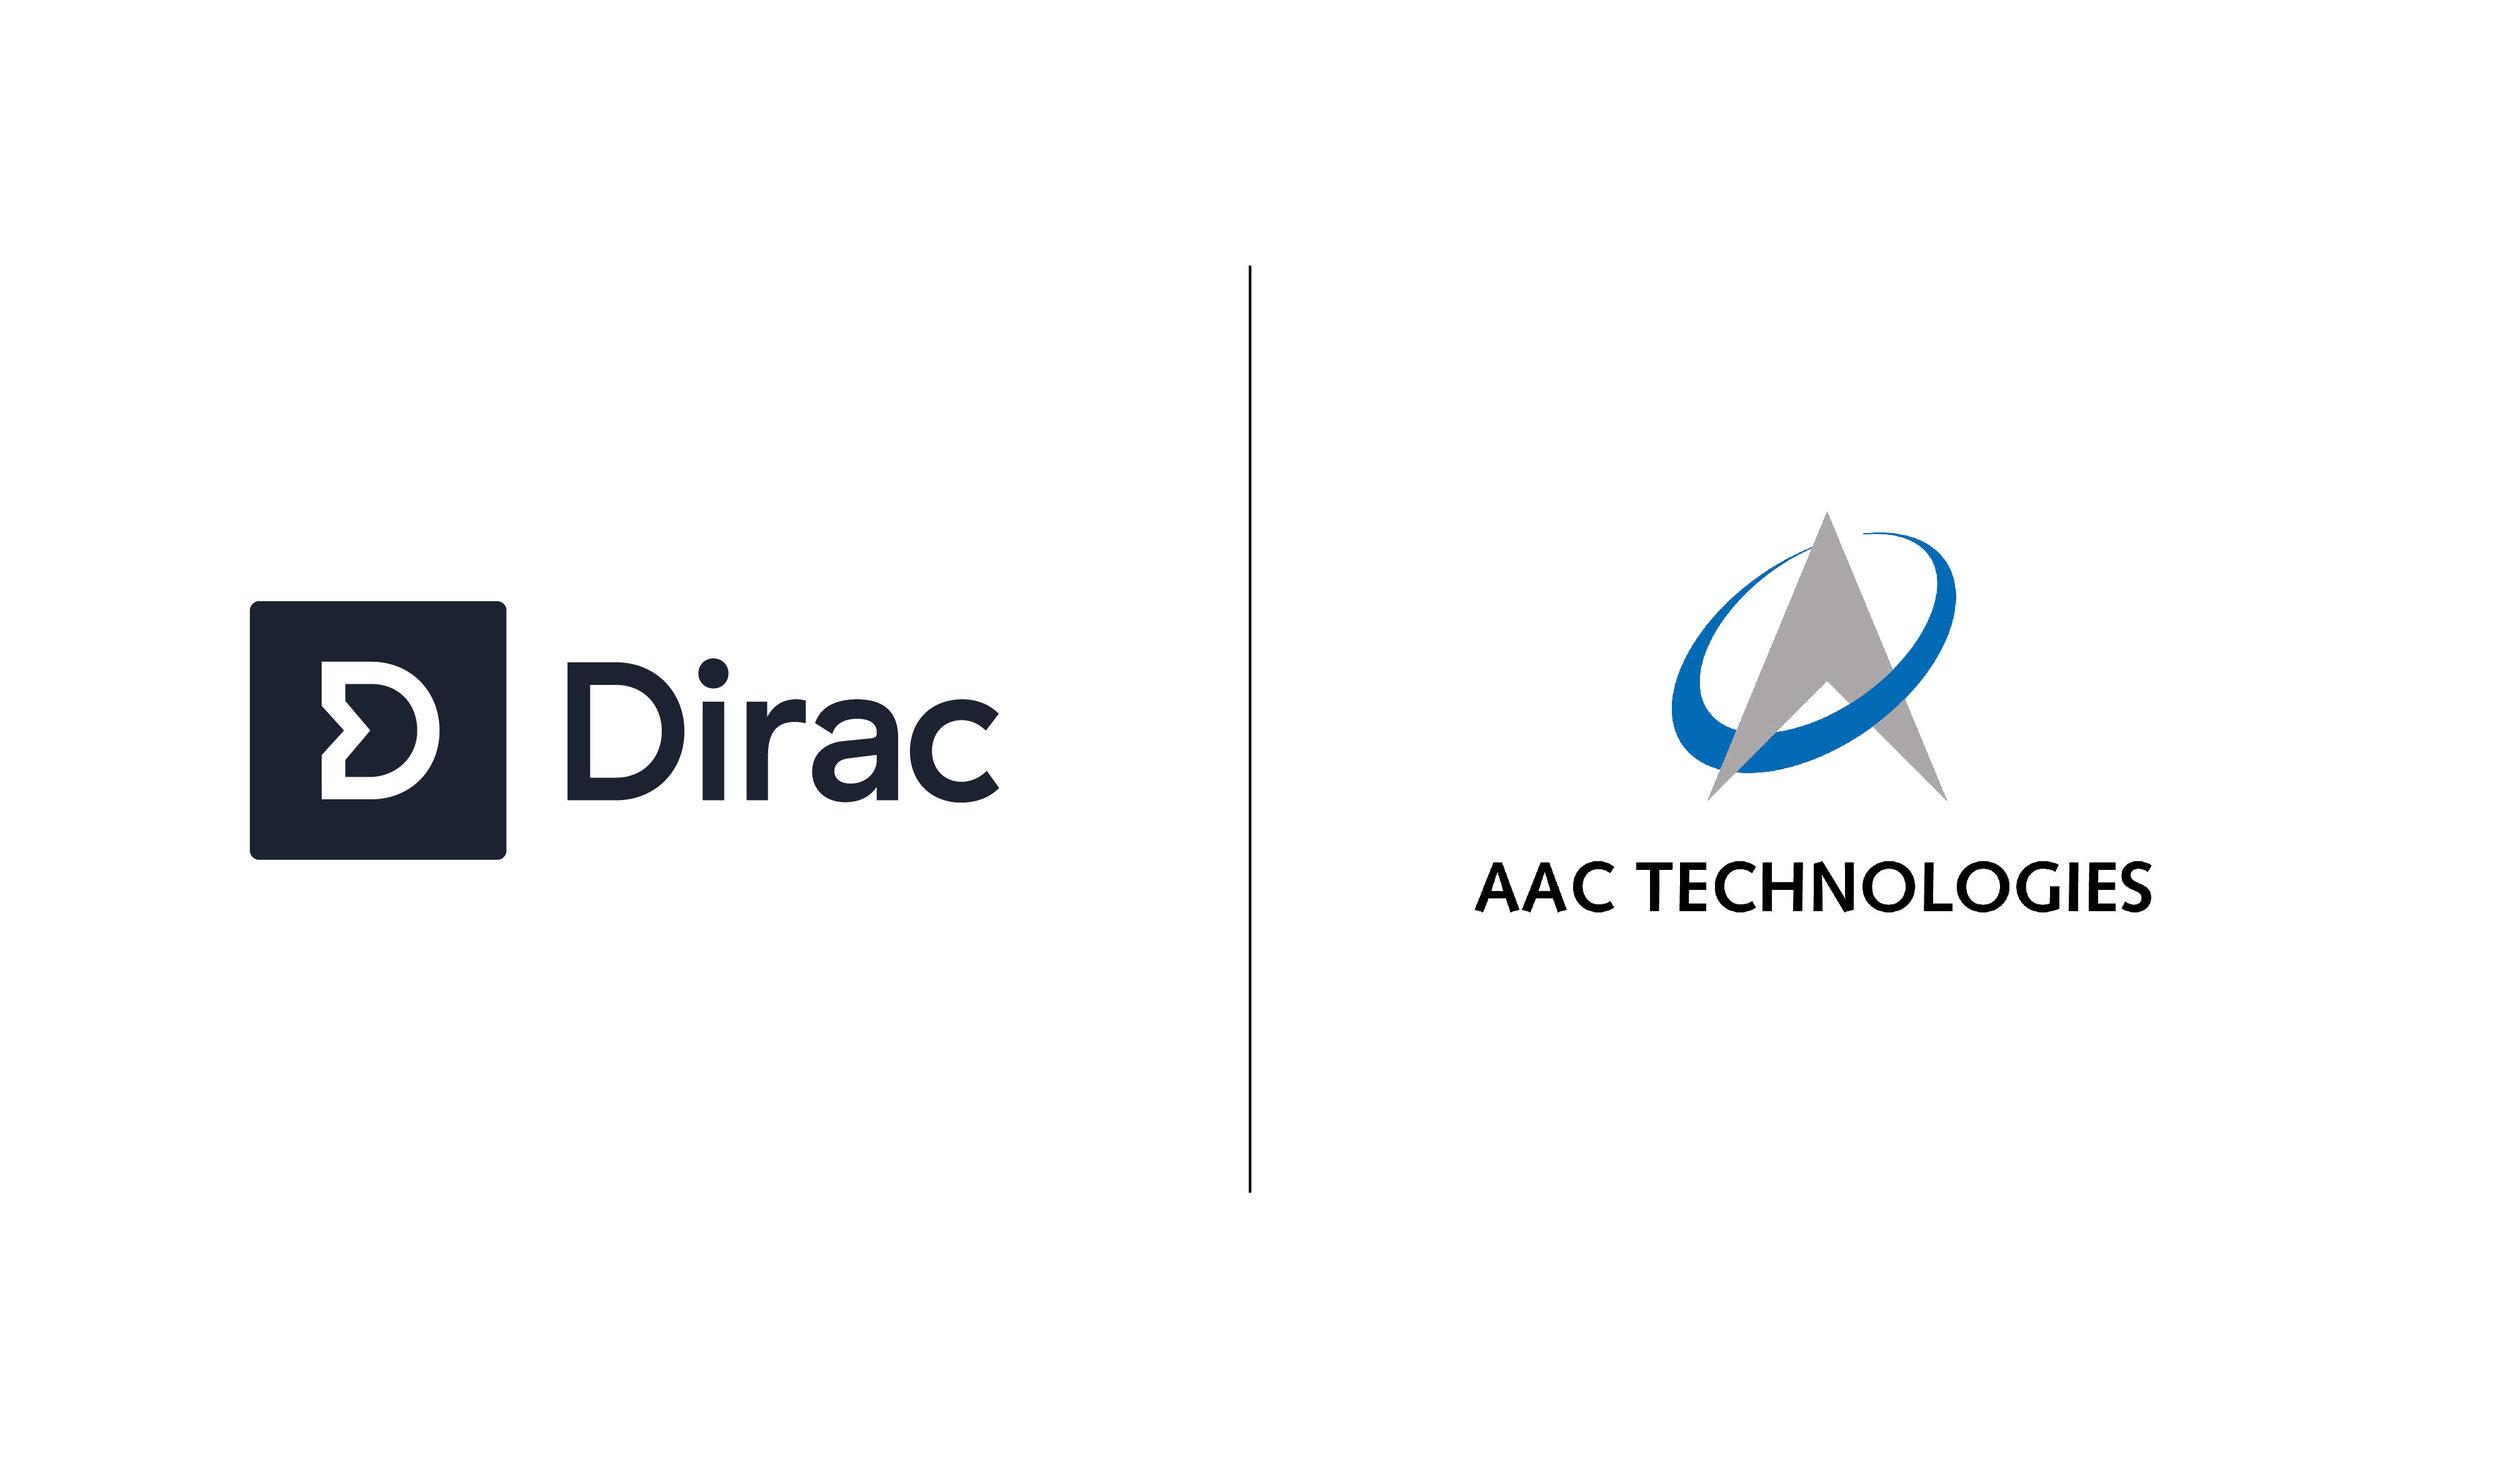 Dirac AAC